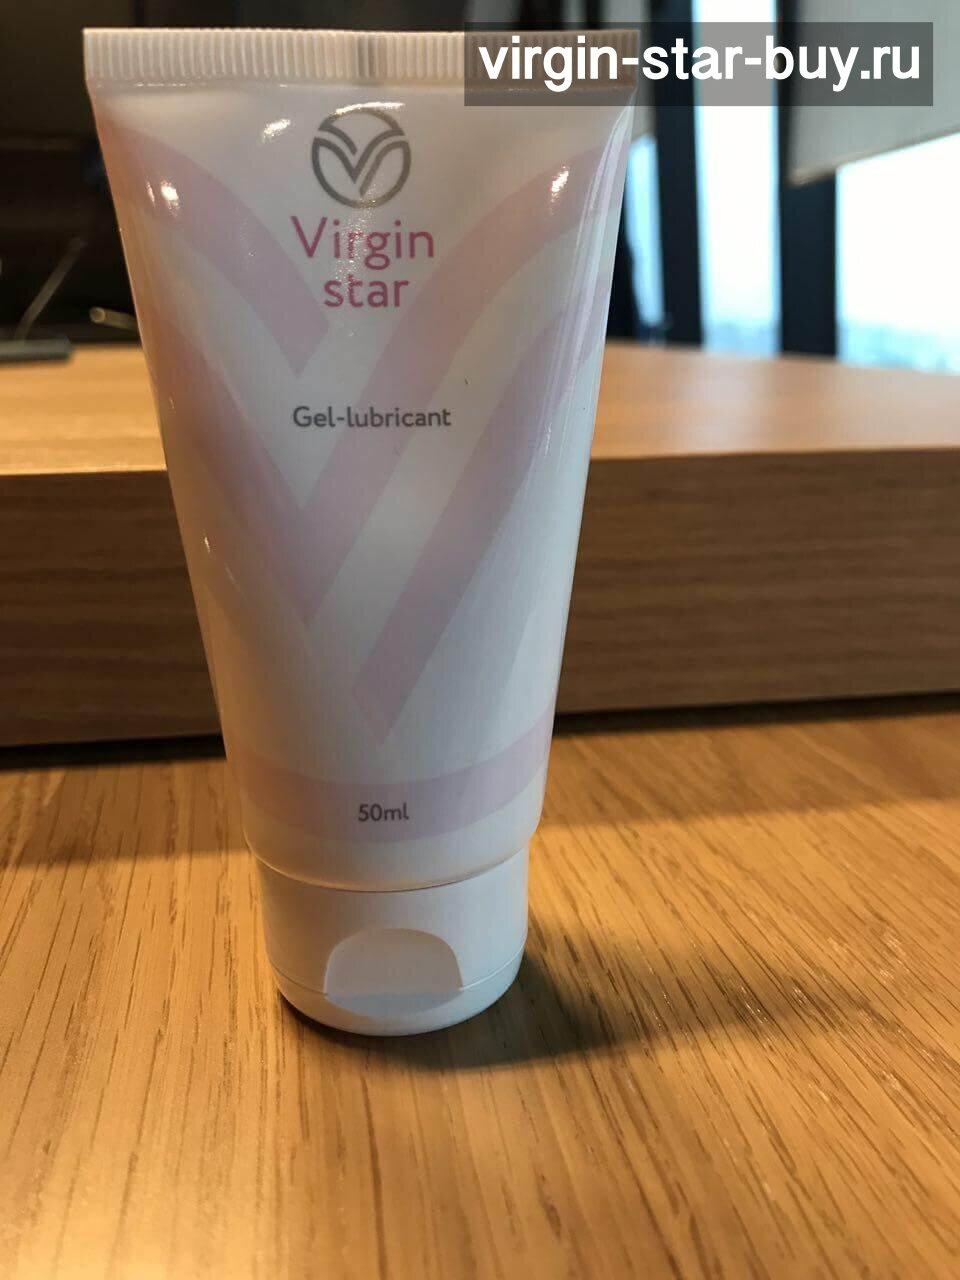 Virgin Star для сокращения мышц влагалища в Константиновке